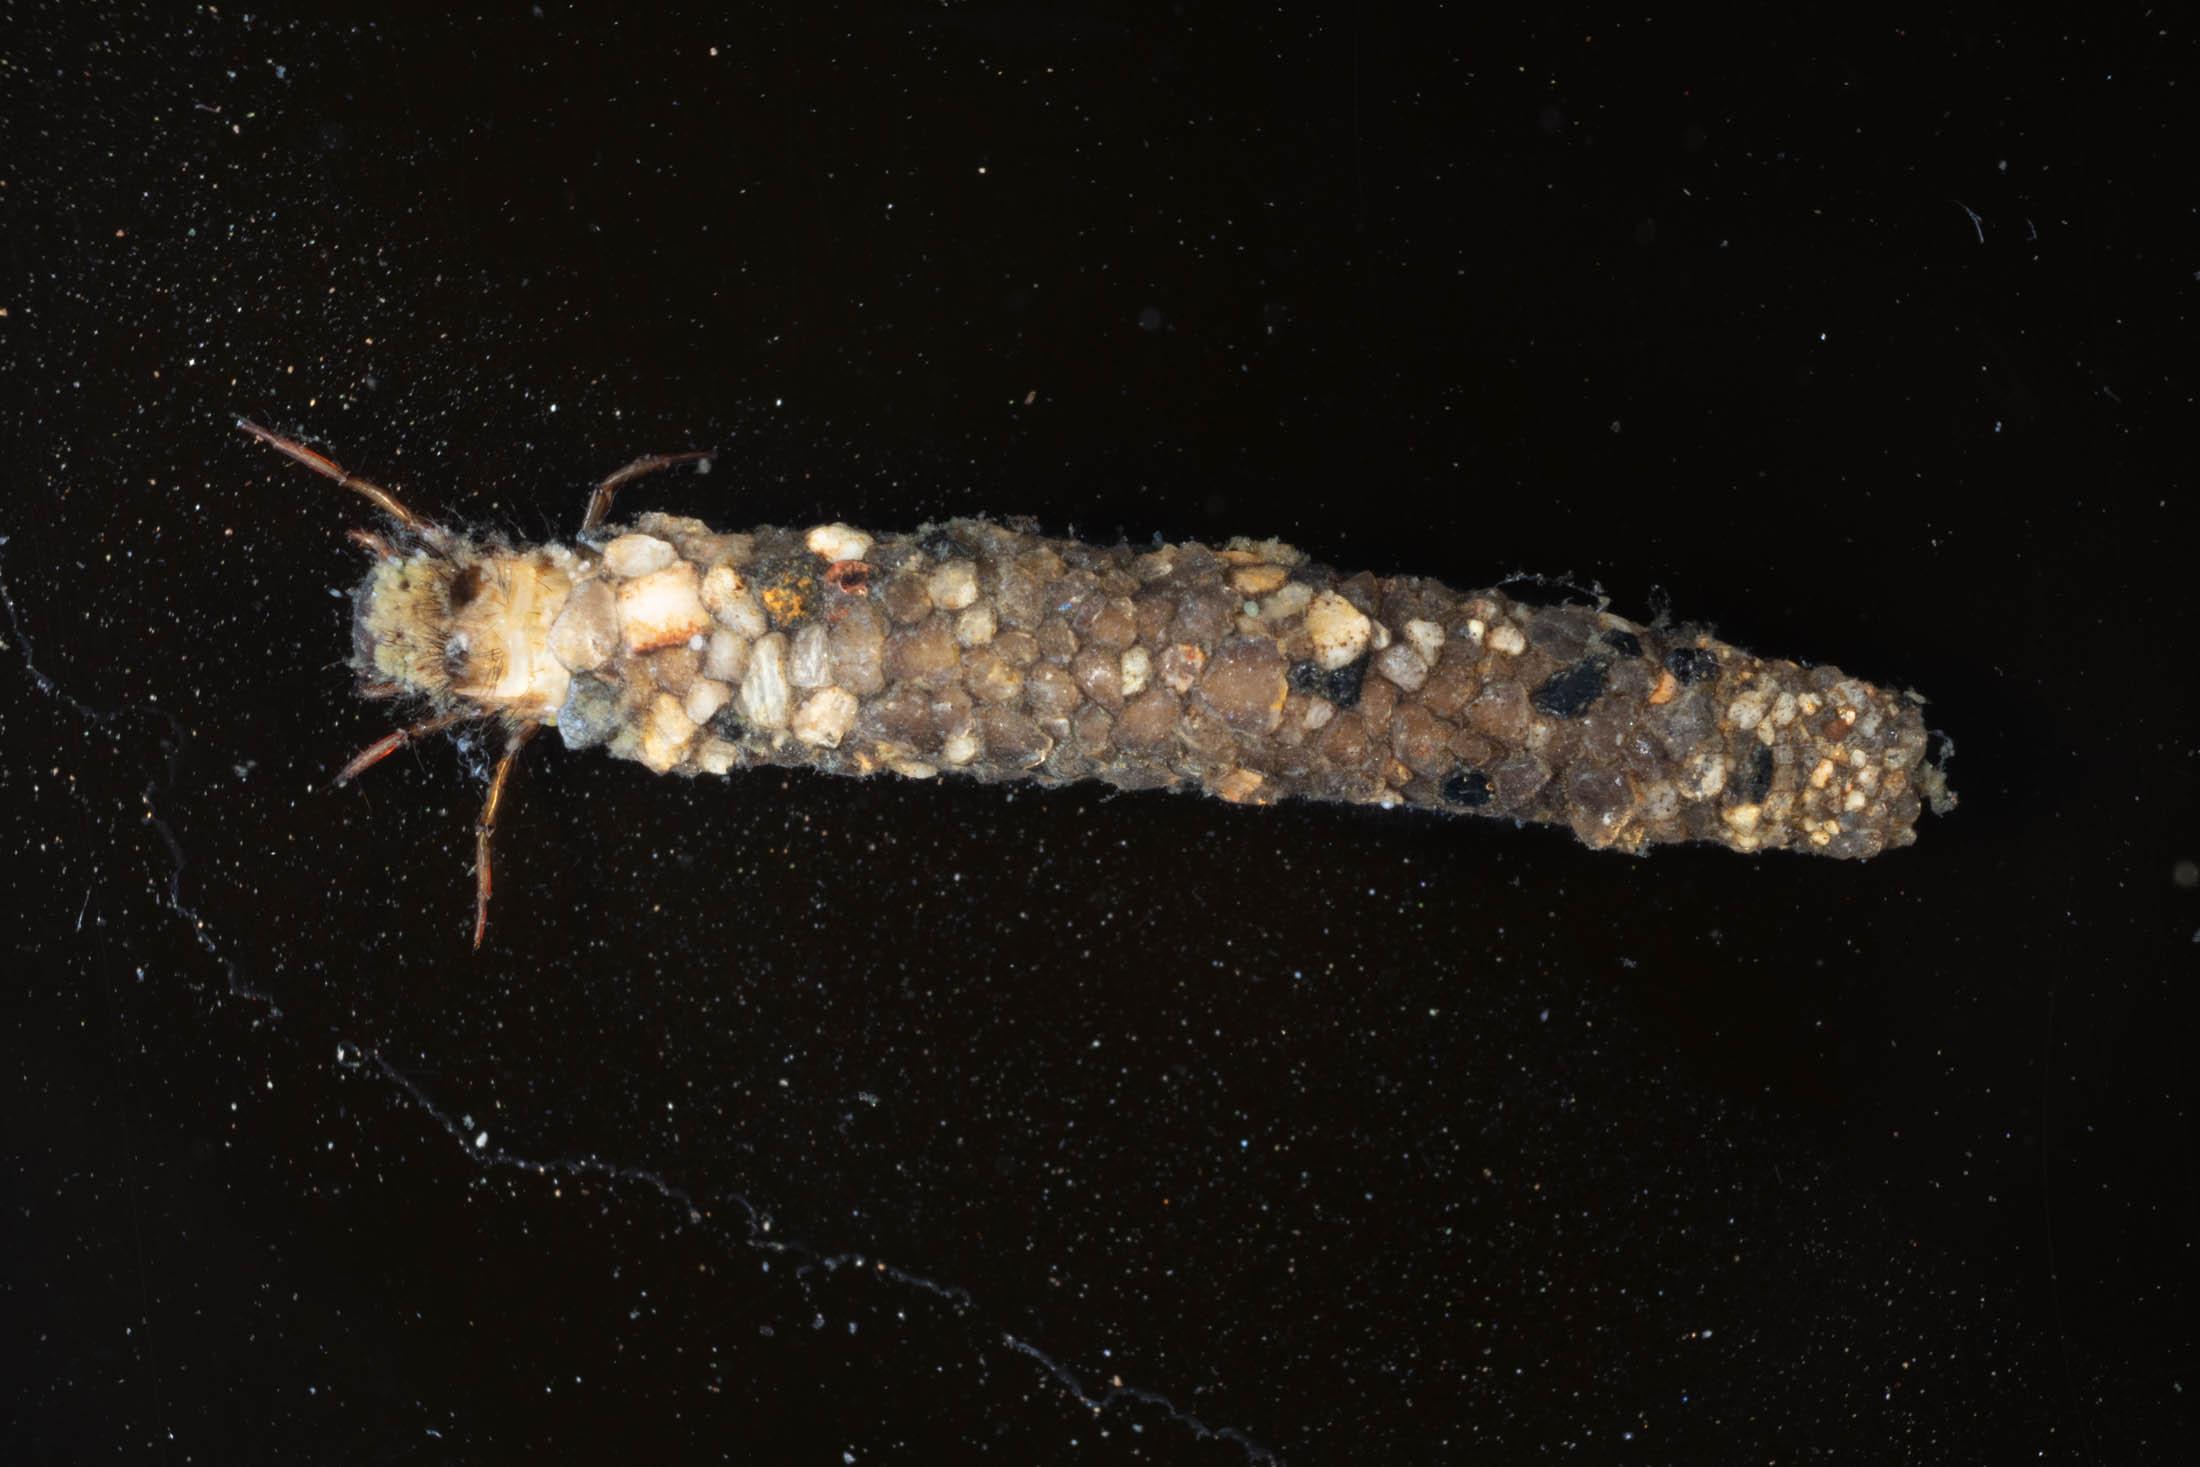 Caddis Fy larva © Nick Baker